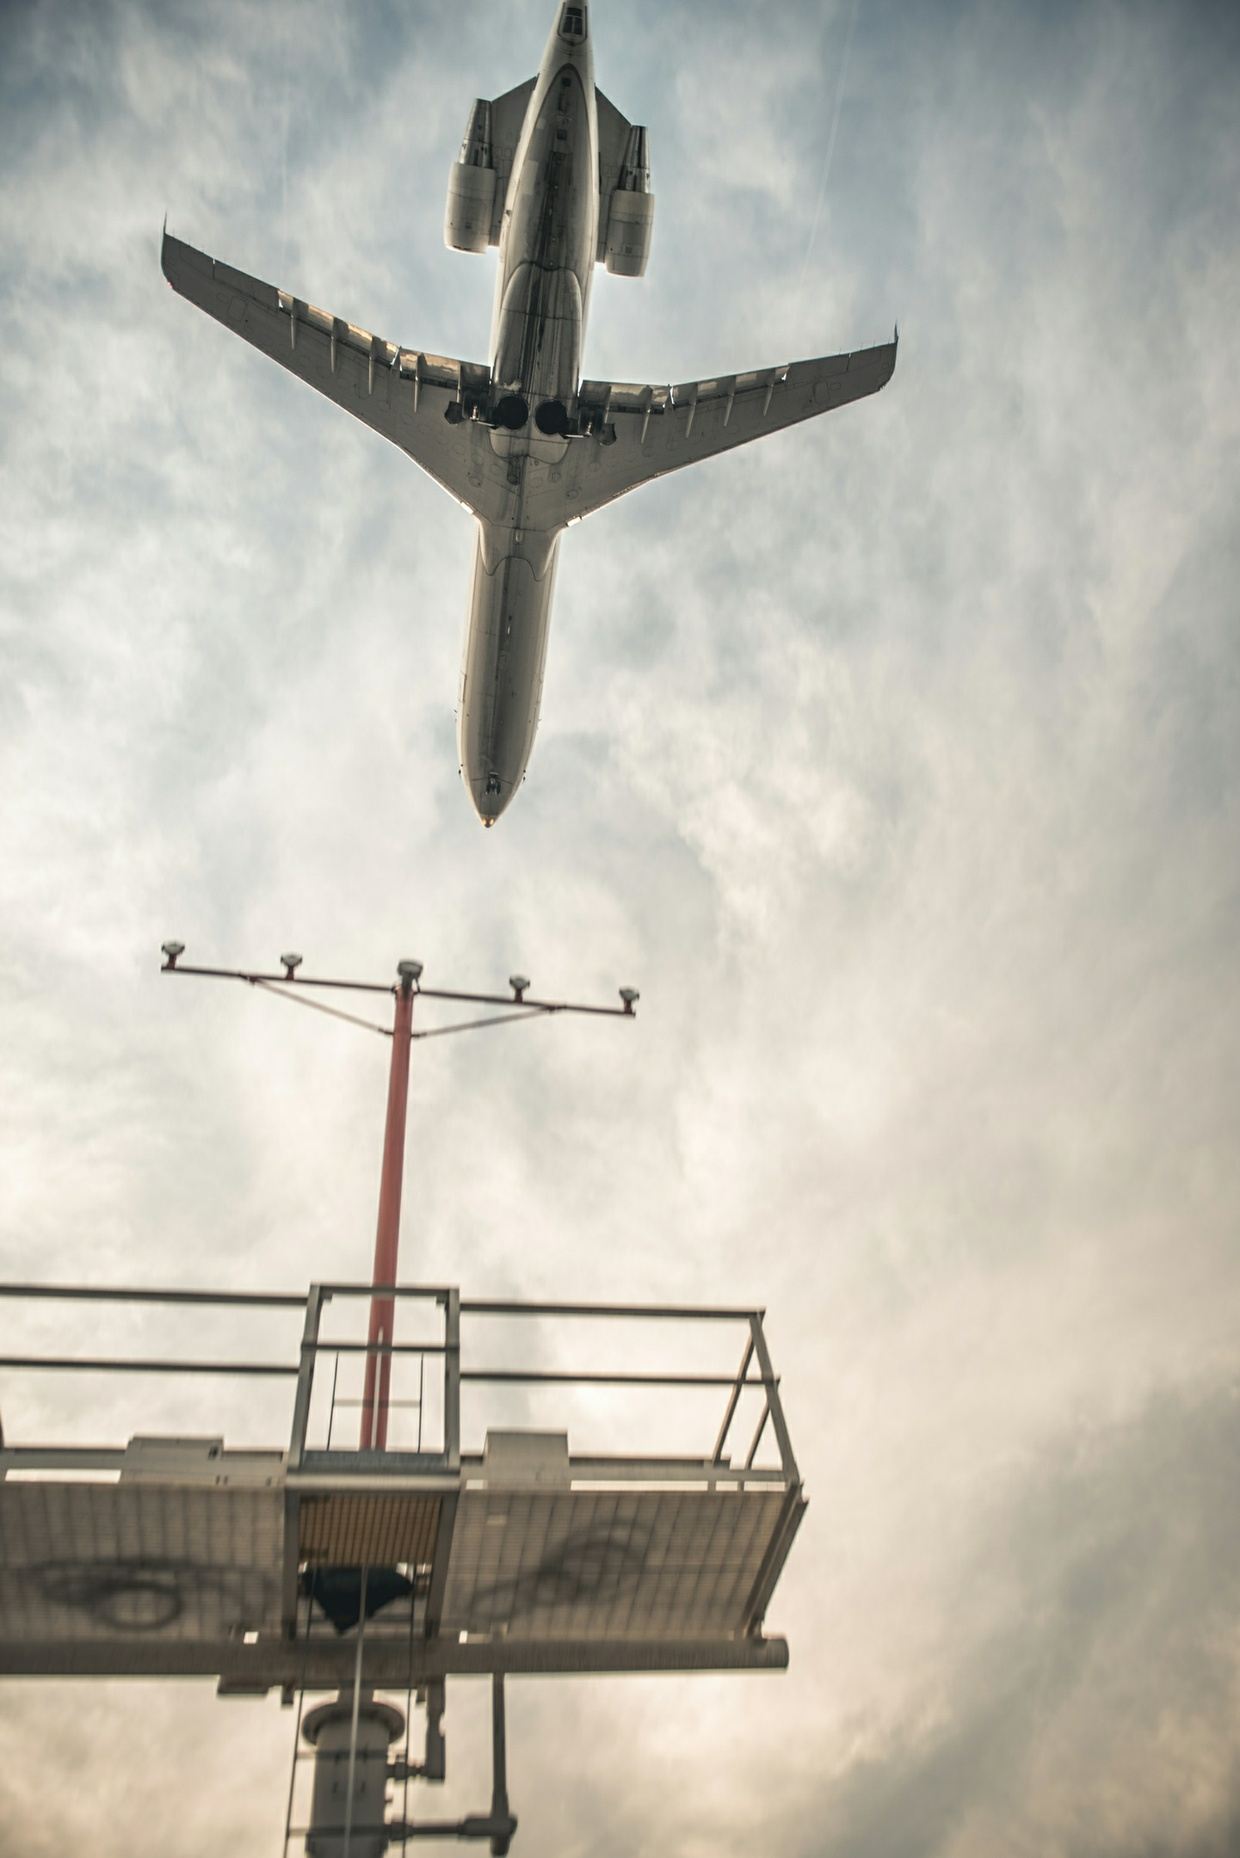 Los Angeles 3 - Airplane